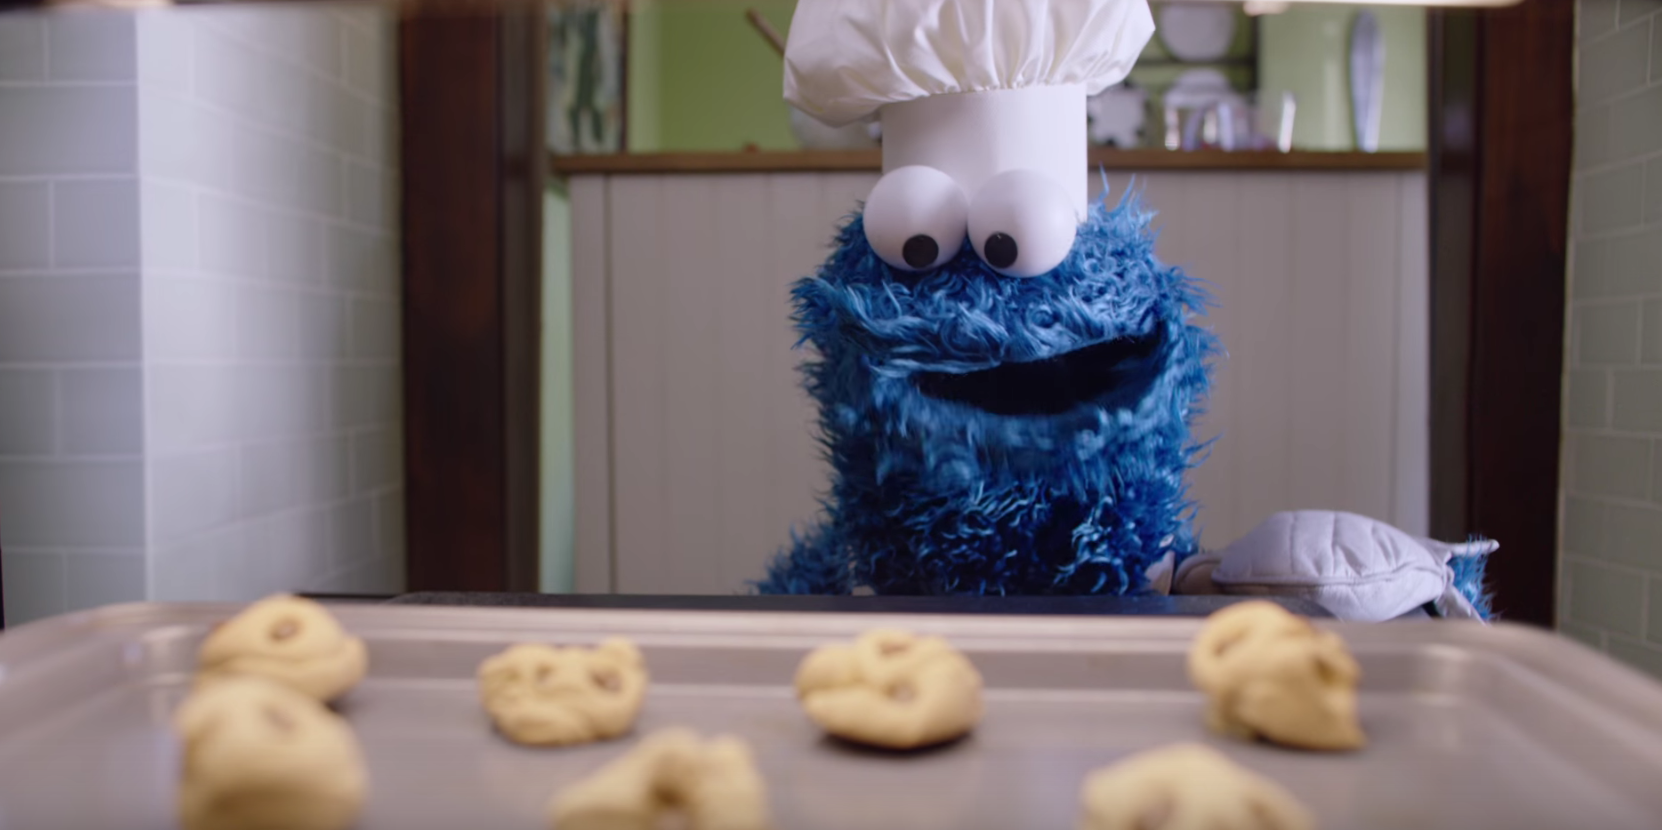 Is Cookie Monster Apple's best spokesperson?